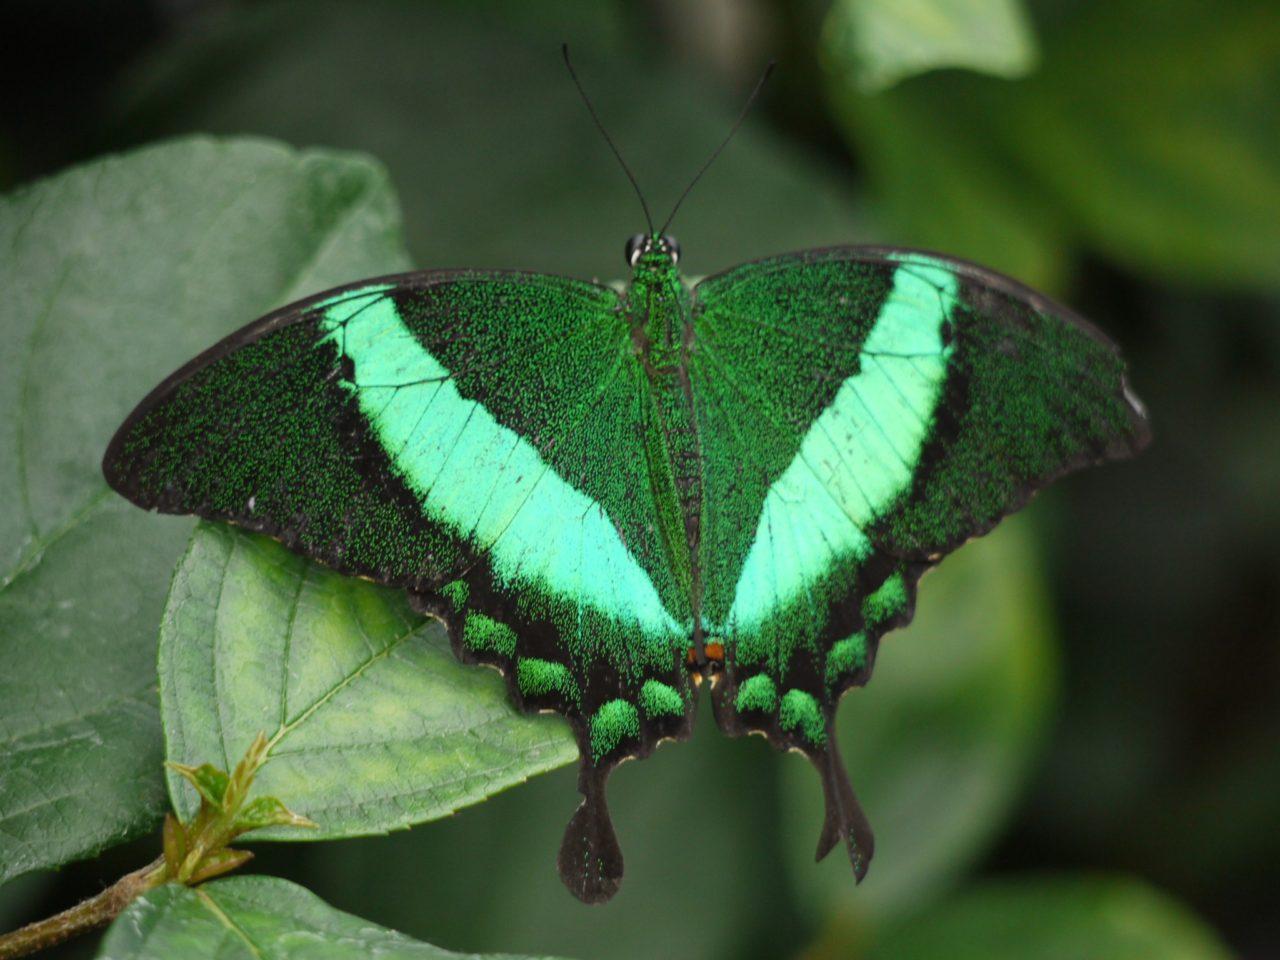 Papillon vert brut de pomme wildlife archives wildlife archives - Pomme papillon ...